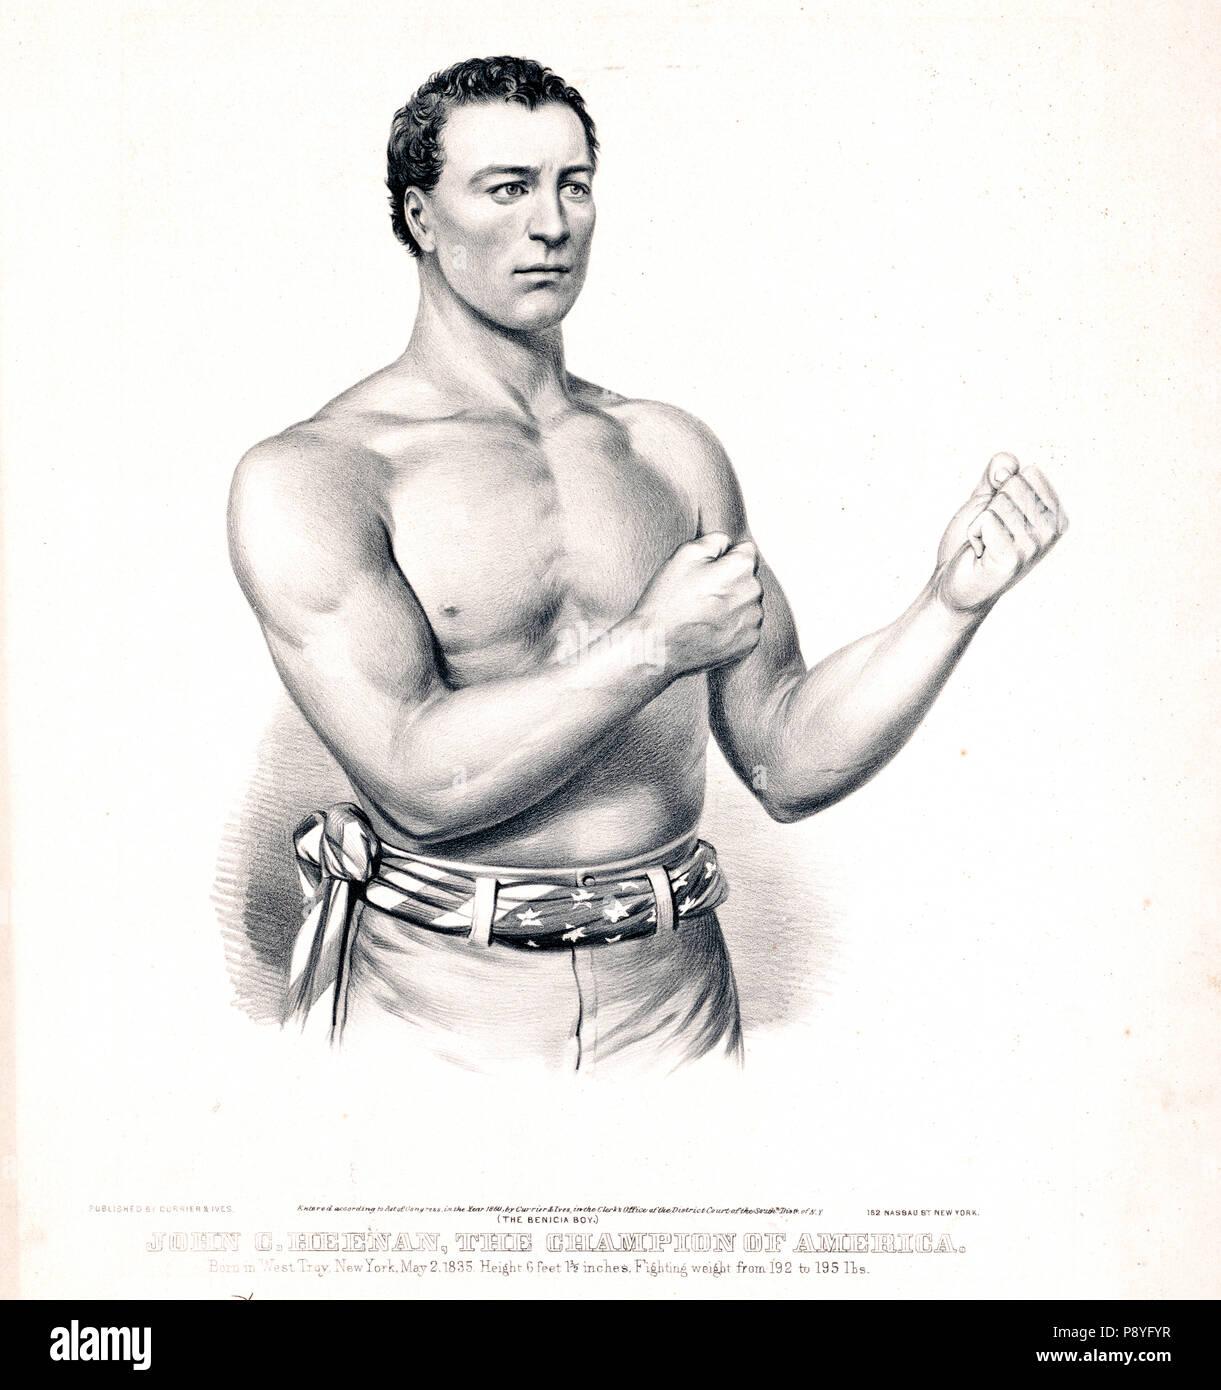 John C. Heenan, the champion of America (the benicia boy) ca 1860 - Stock Image